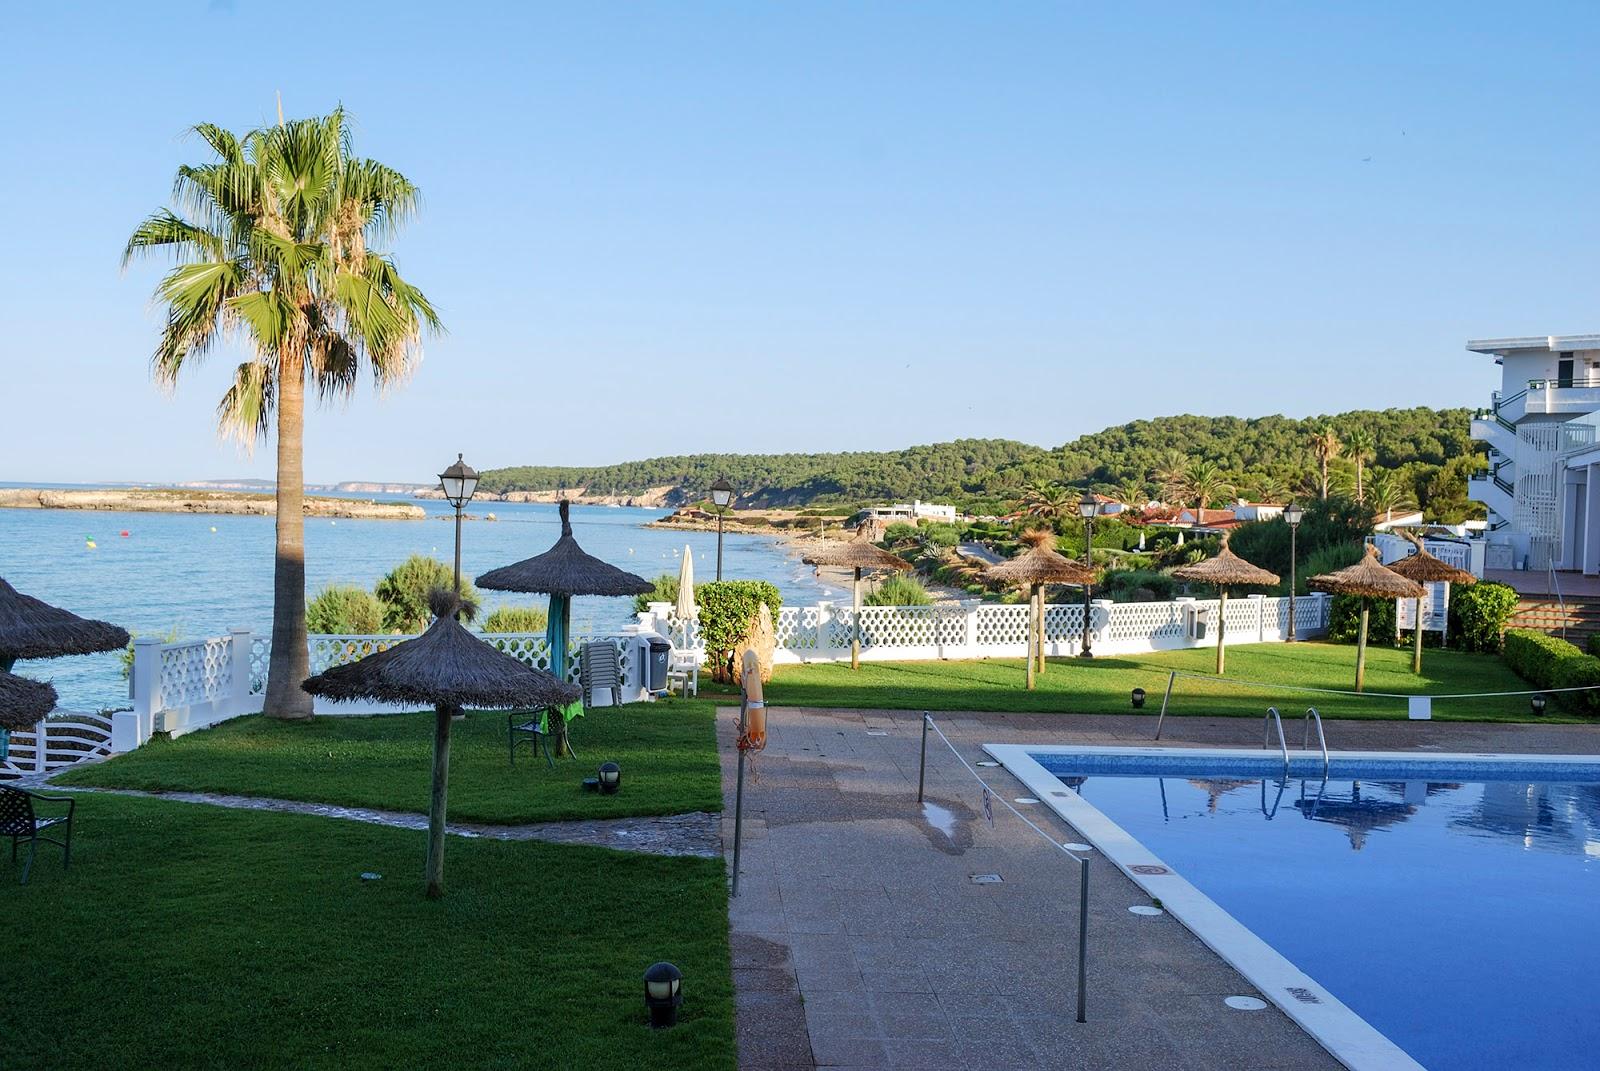 Sol Beach House Menorca Spain Melia Hotel swimming pool